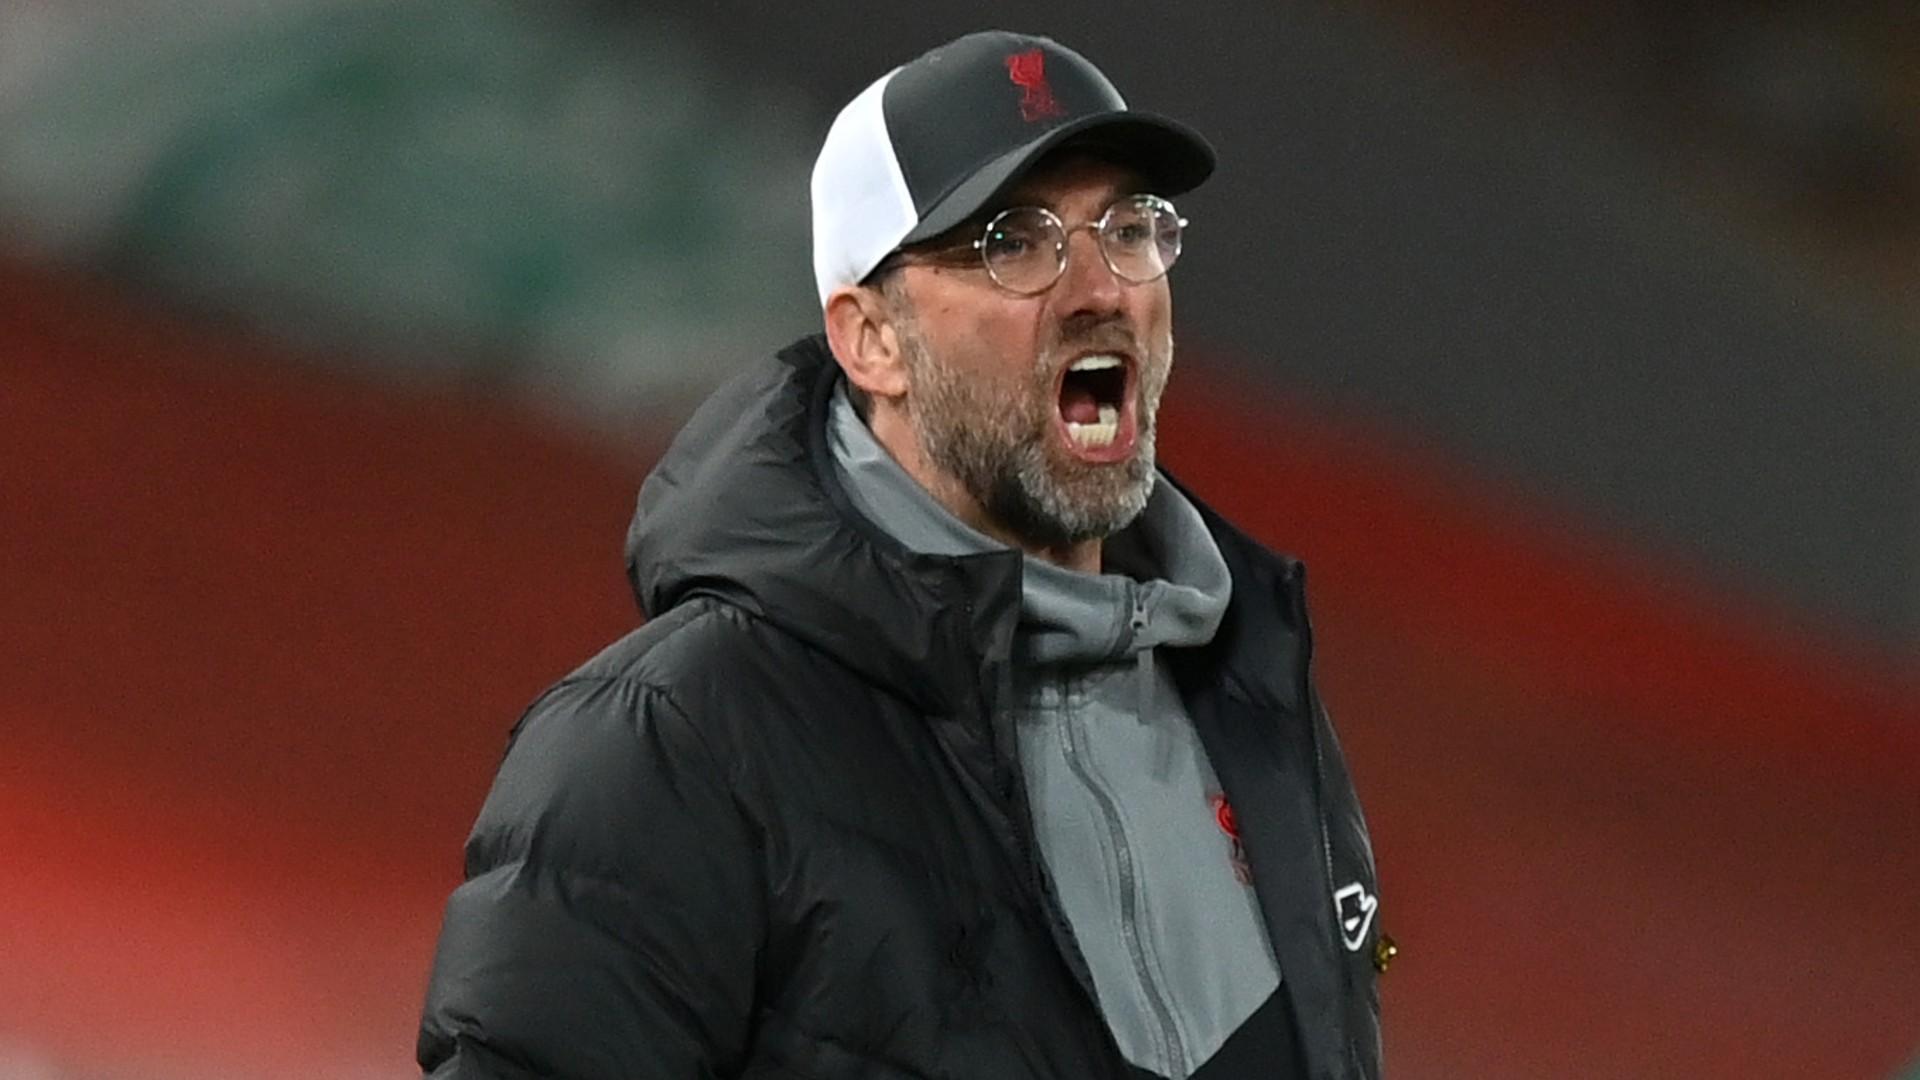 Klopp: We didn't lose the tie at Anfield - we definitely lost it in Madrid